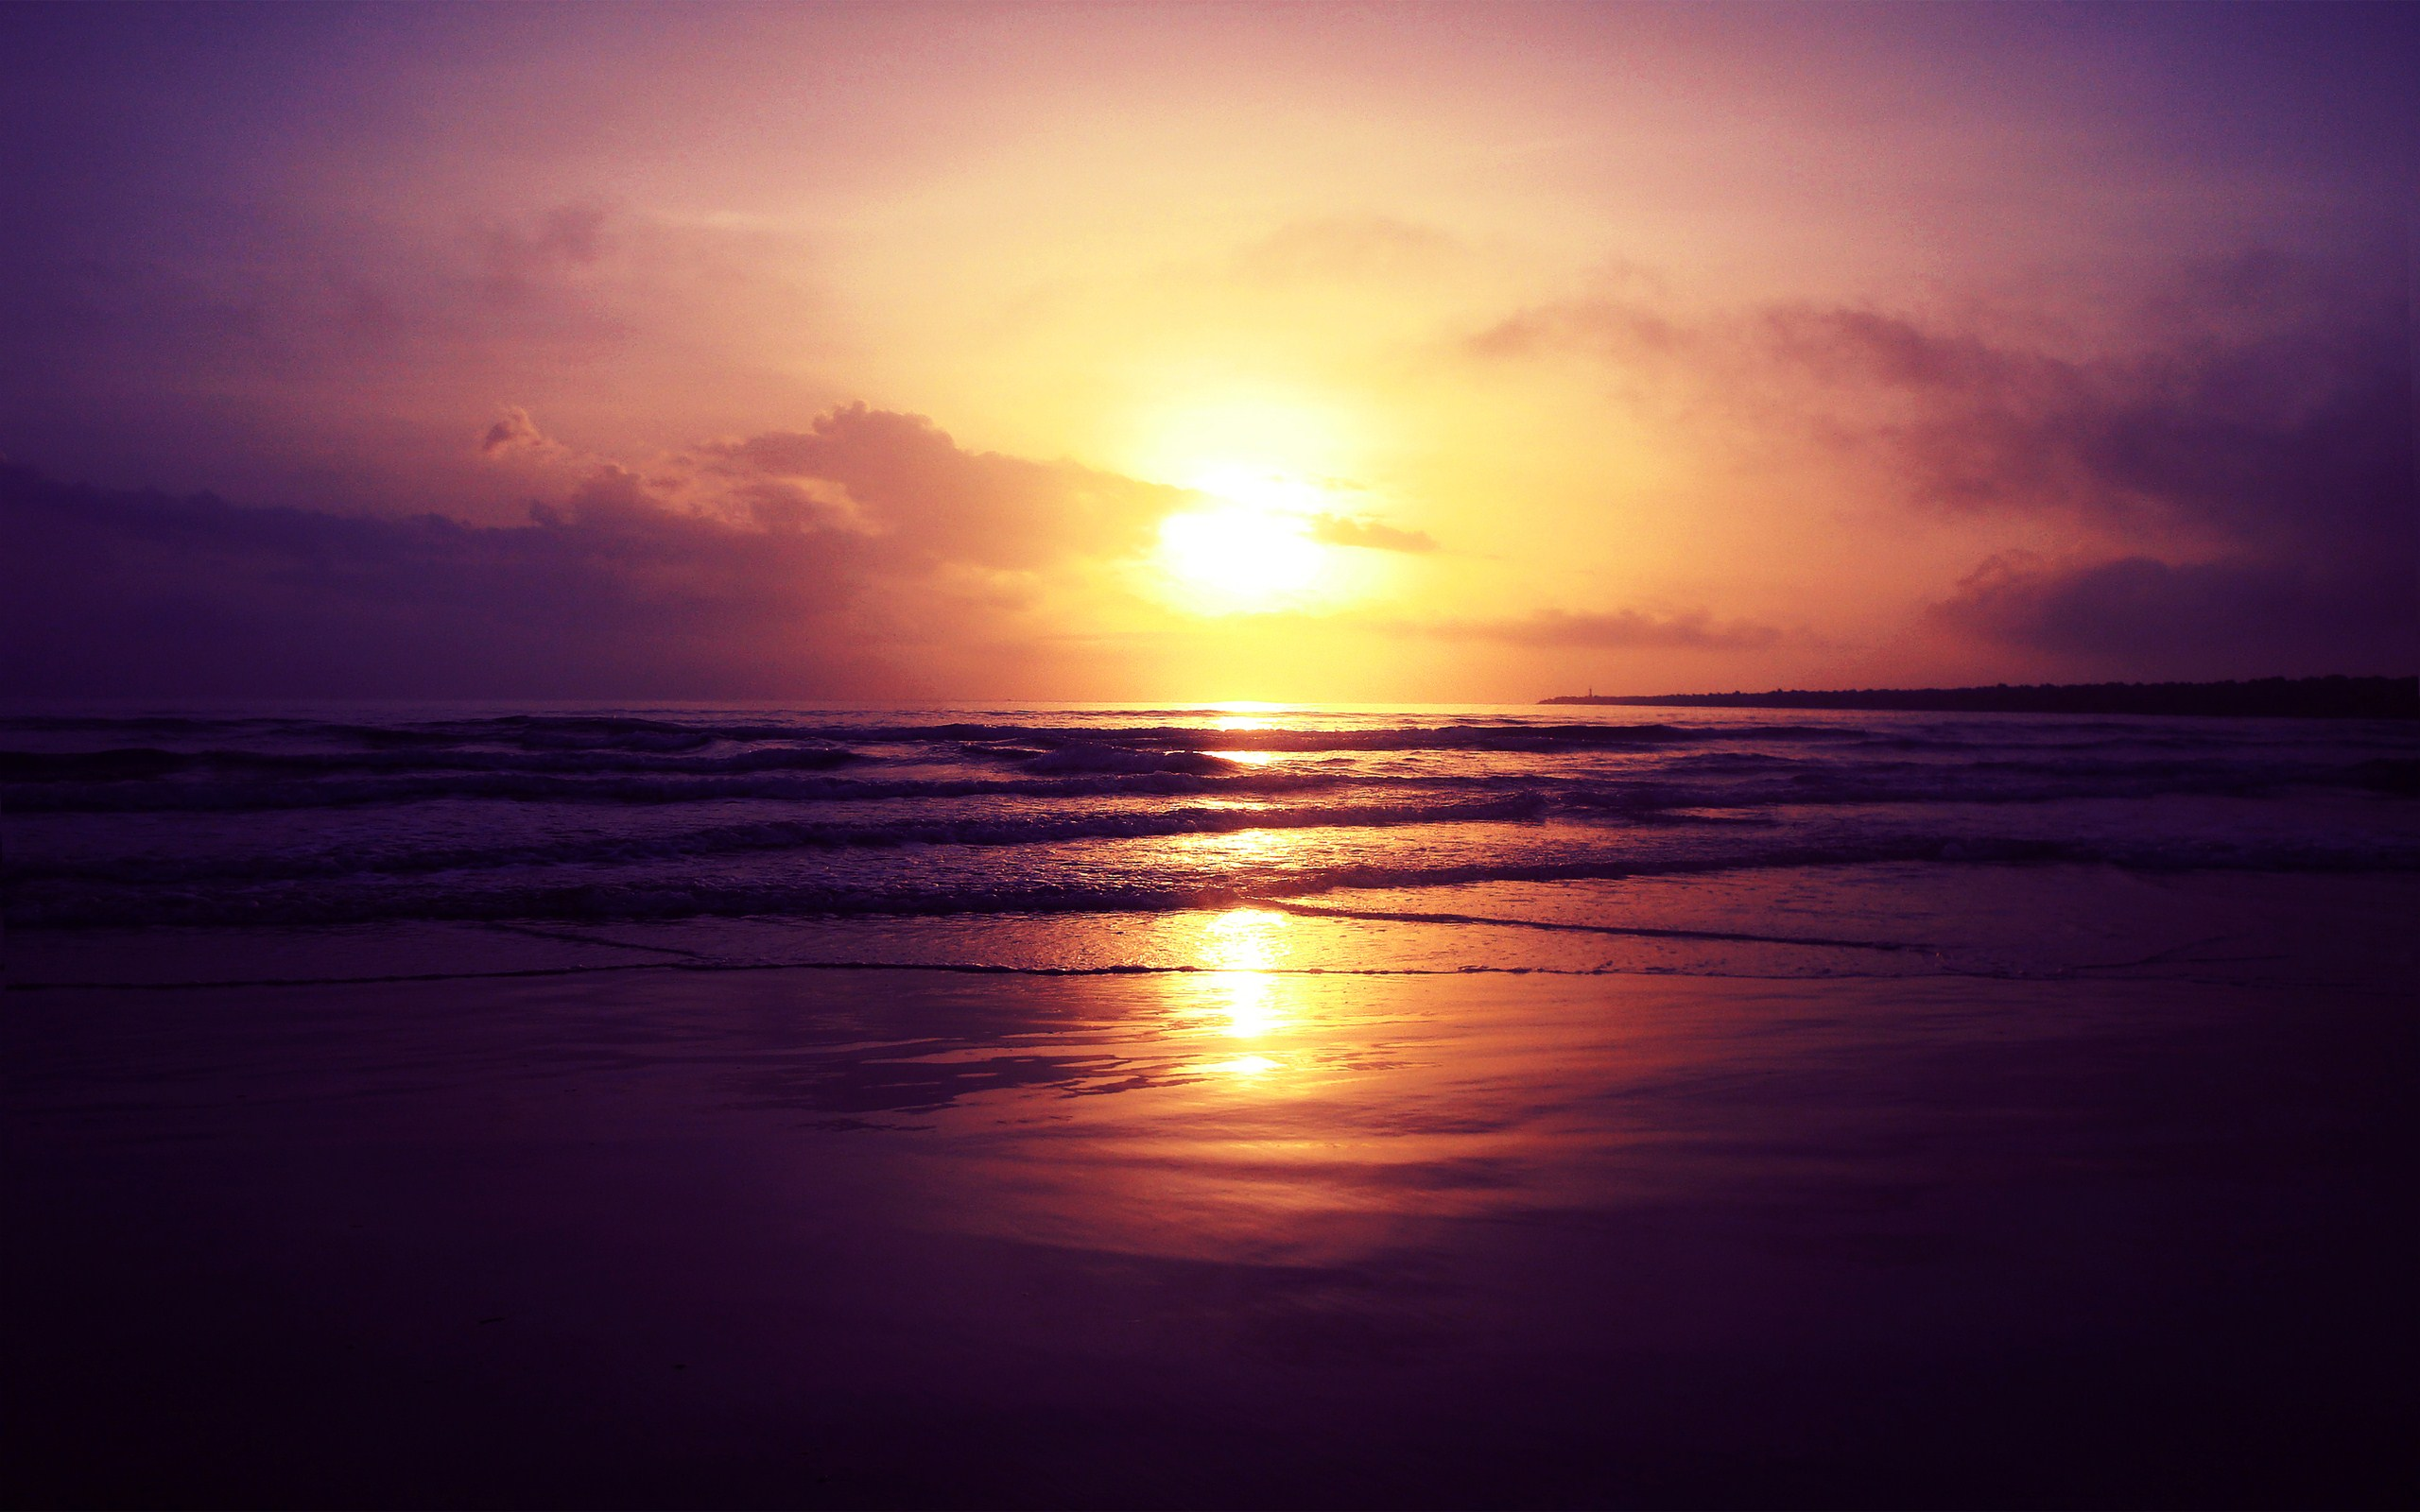 Beach Sunset Wallpapers | HD Wallpapers